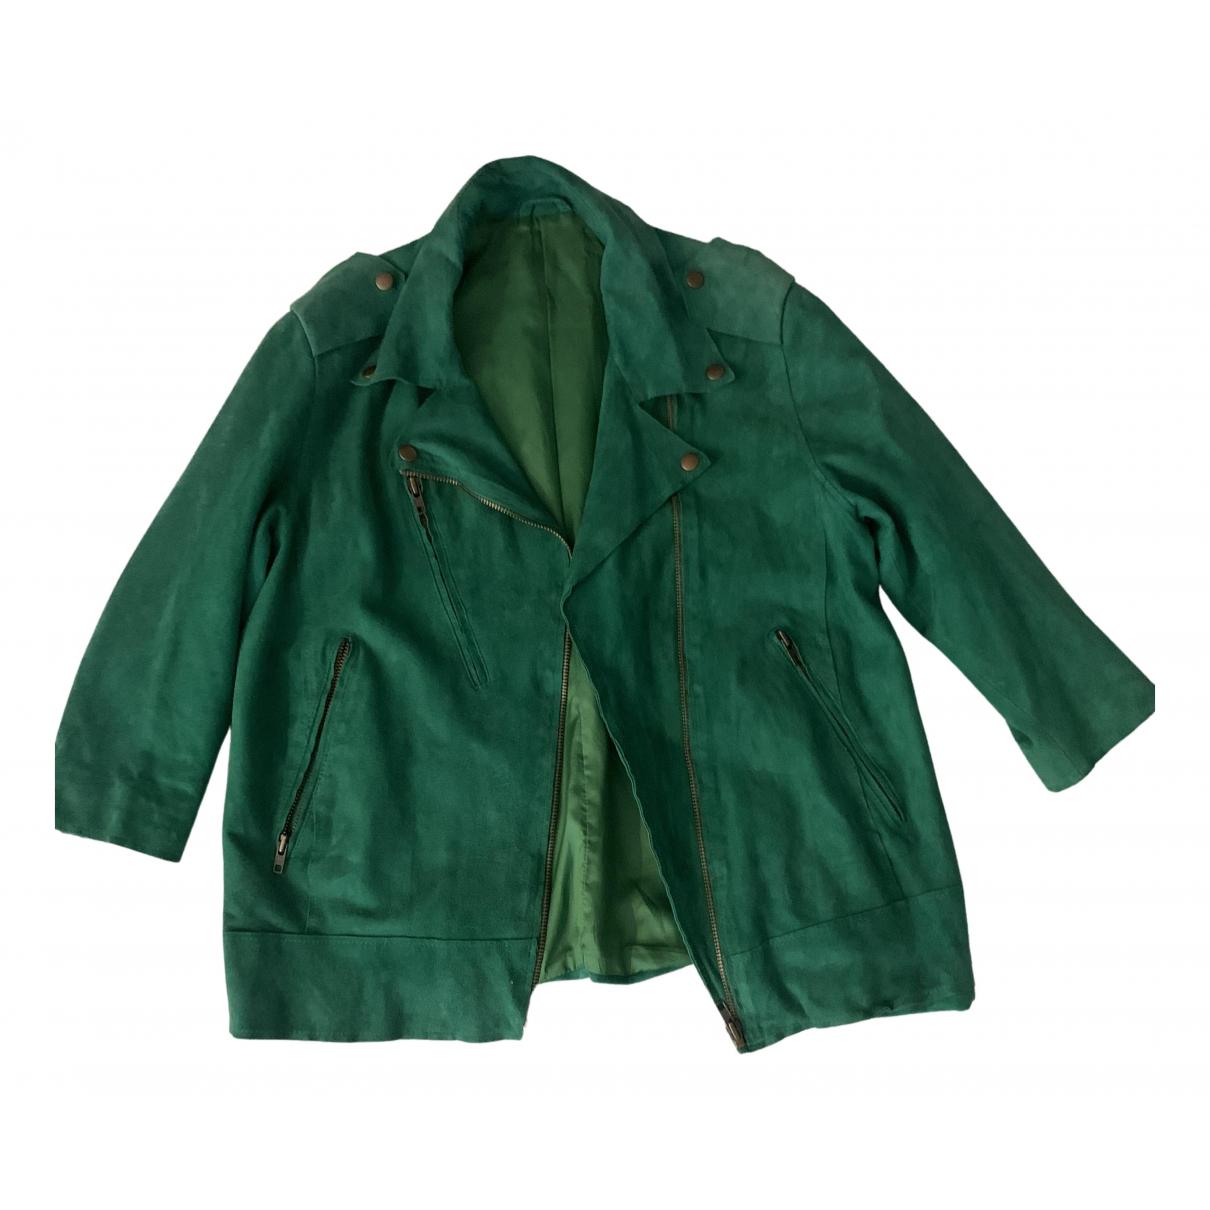 Acne Studios - Veste   pour femme en suede - vert